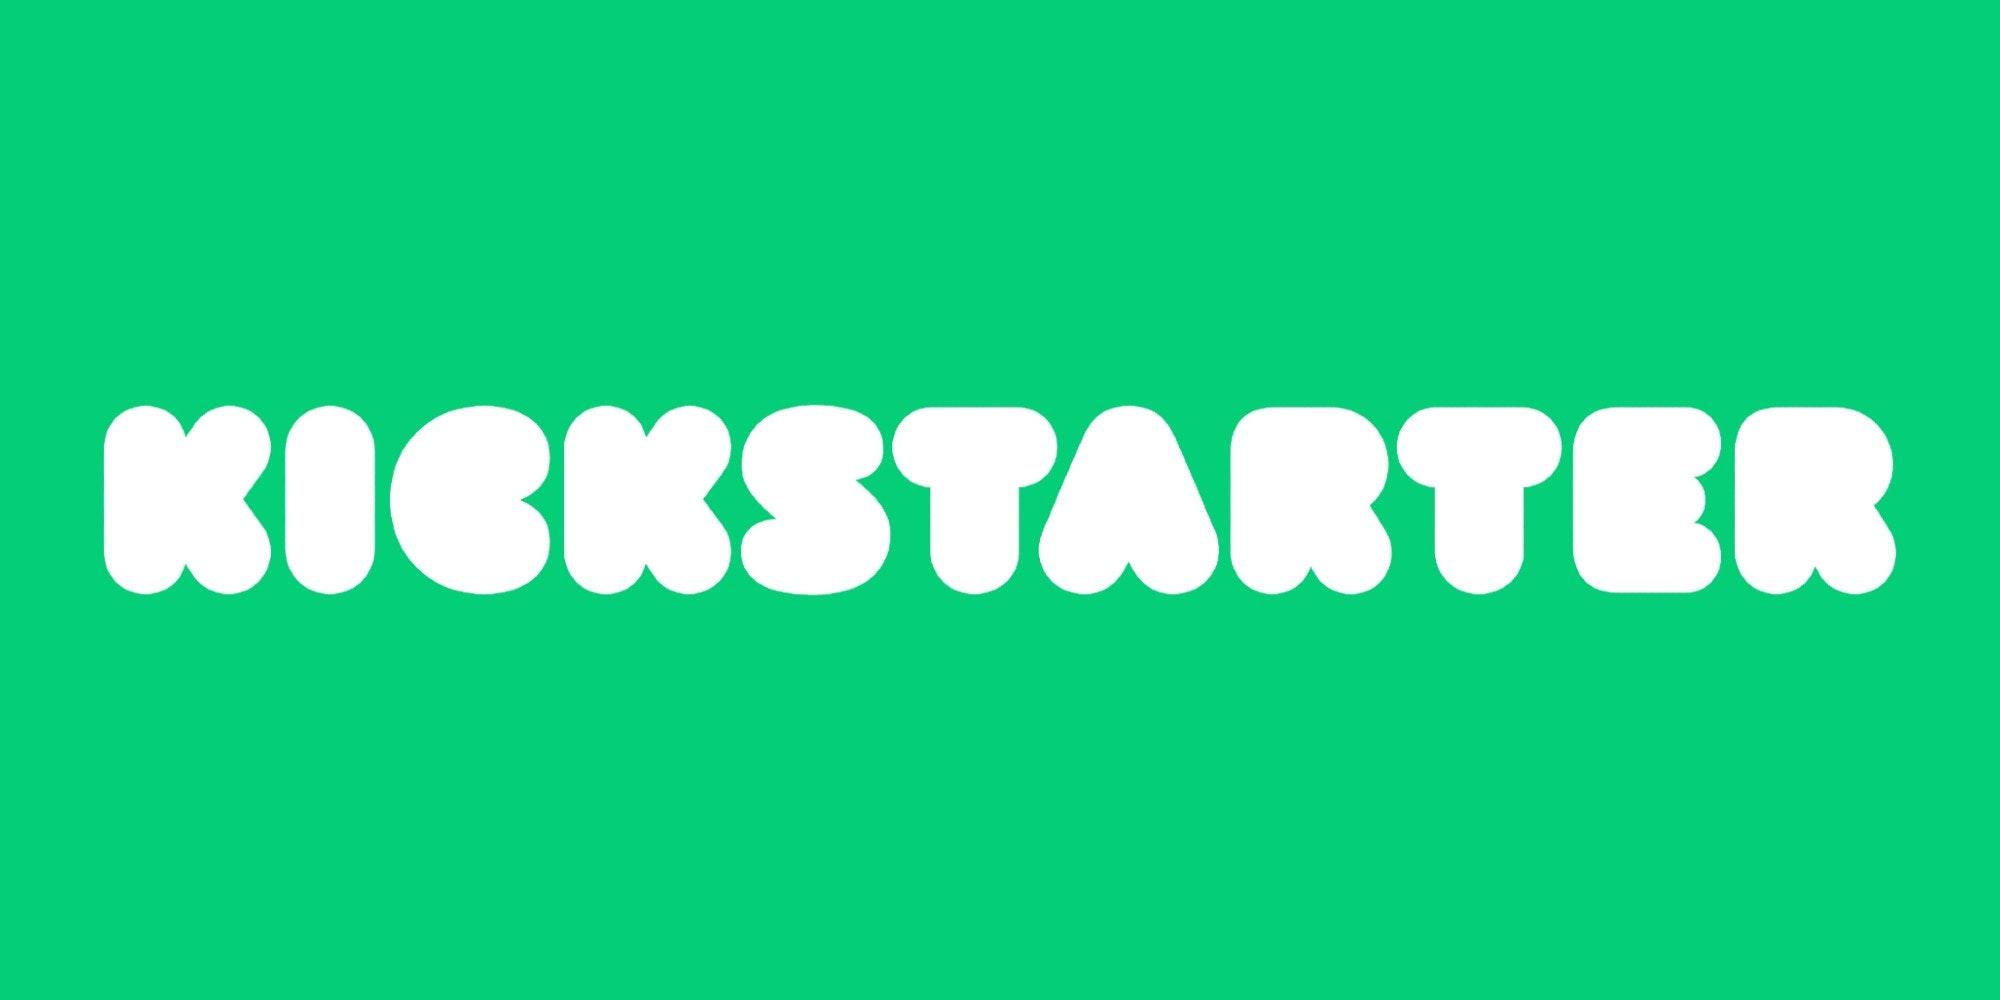 The Kickstarter logo